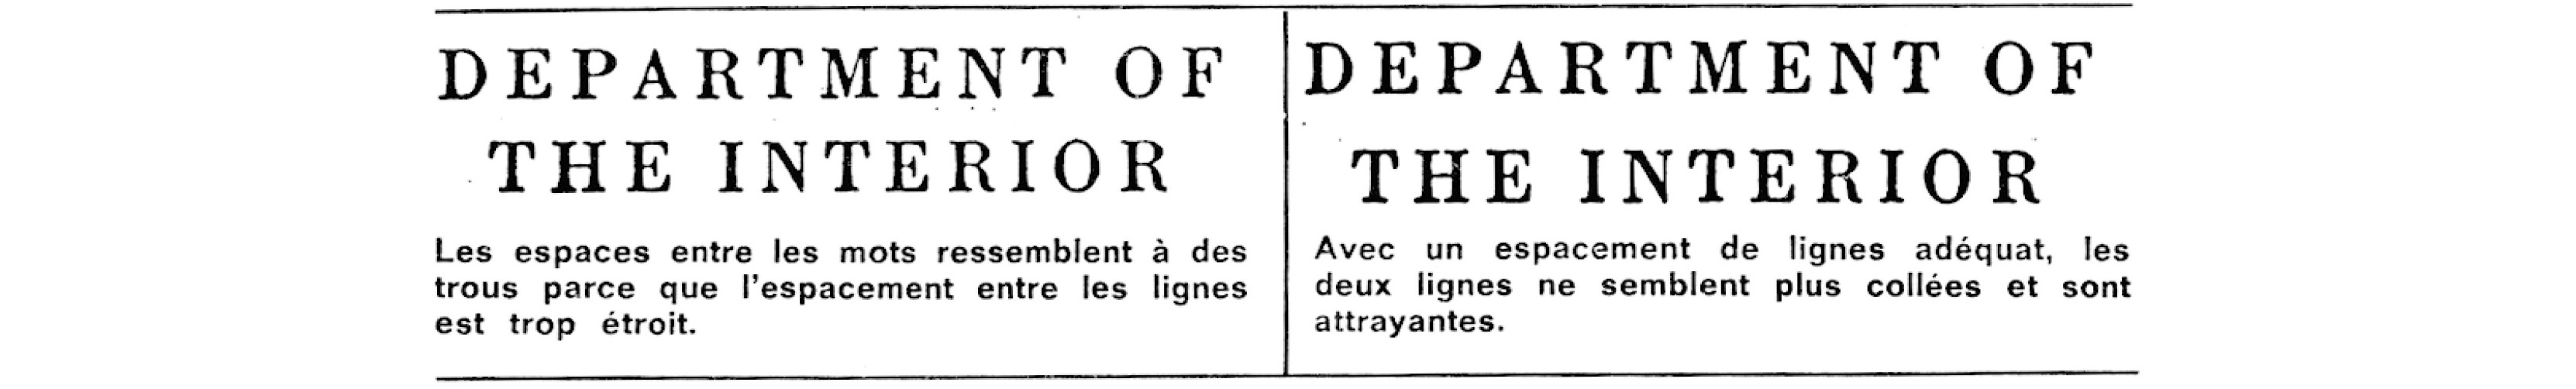 Jan-Tschichold-te-parle-de-typographie-article-Persee-communication-et-langages-1985-schema-04